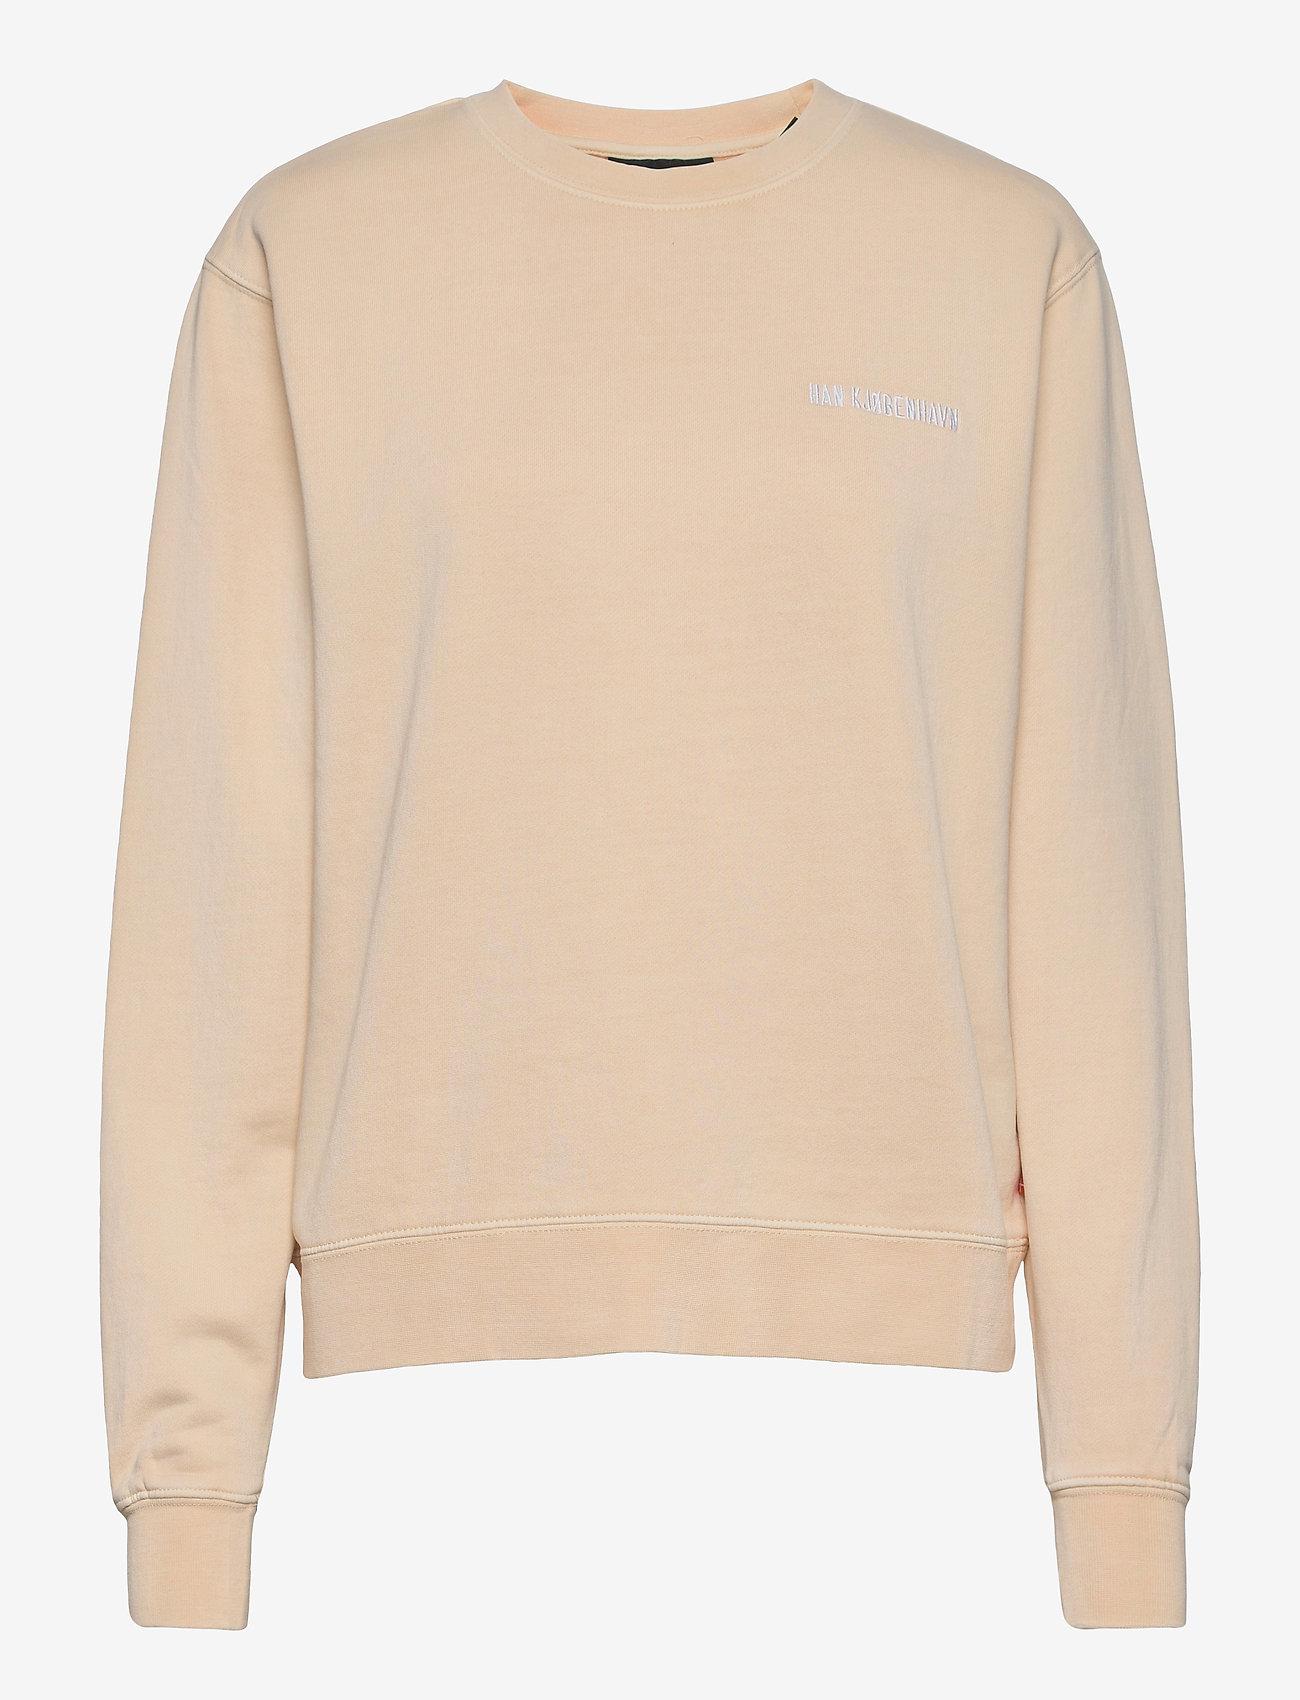 HAN Kjøbenhavn - Bulky Crew - sweatshirts - beige logo - 0